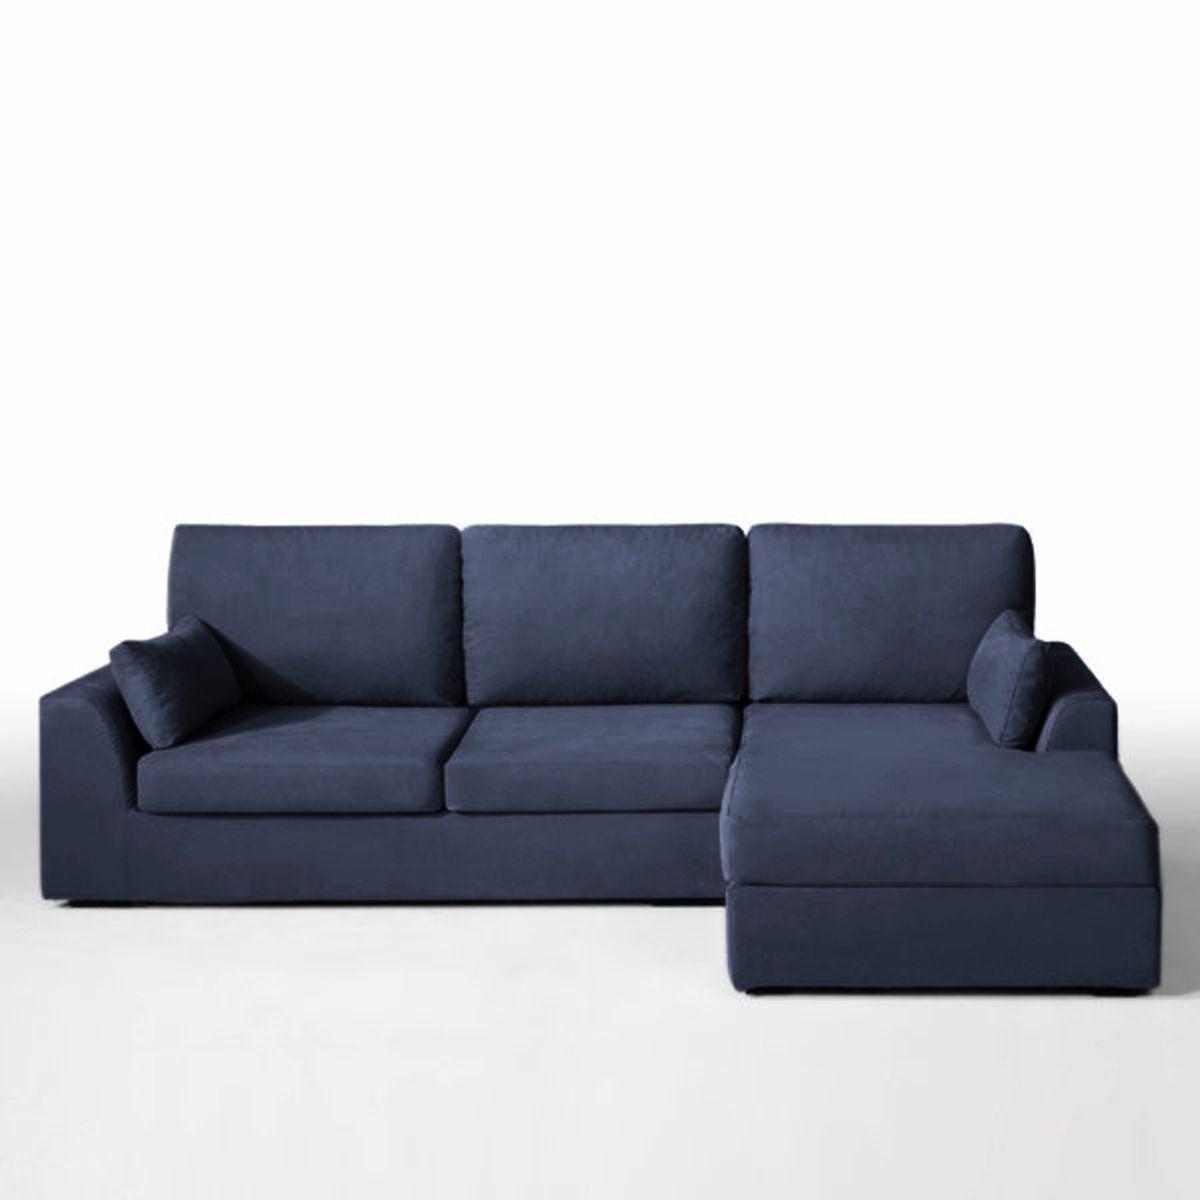 canap d angle convertible madison coton lin. Black Bedroom Furniture Sets. Home Design Ideas